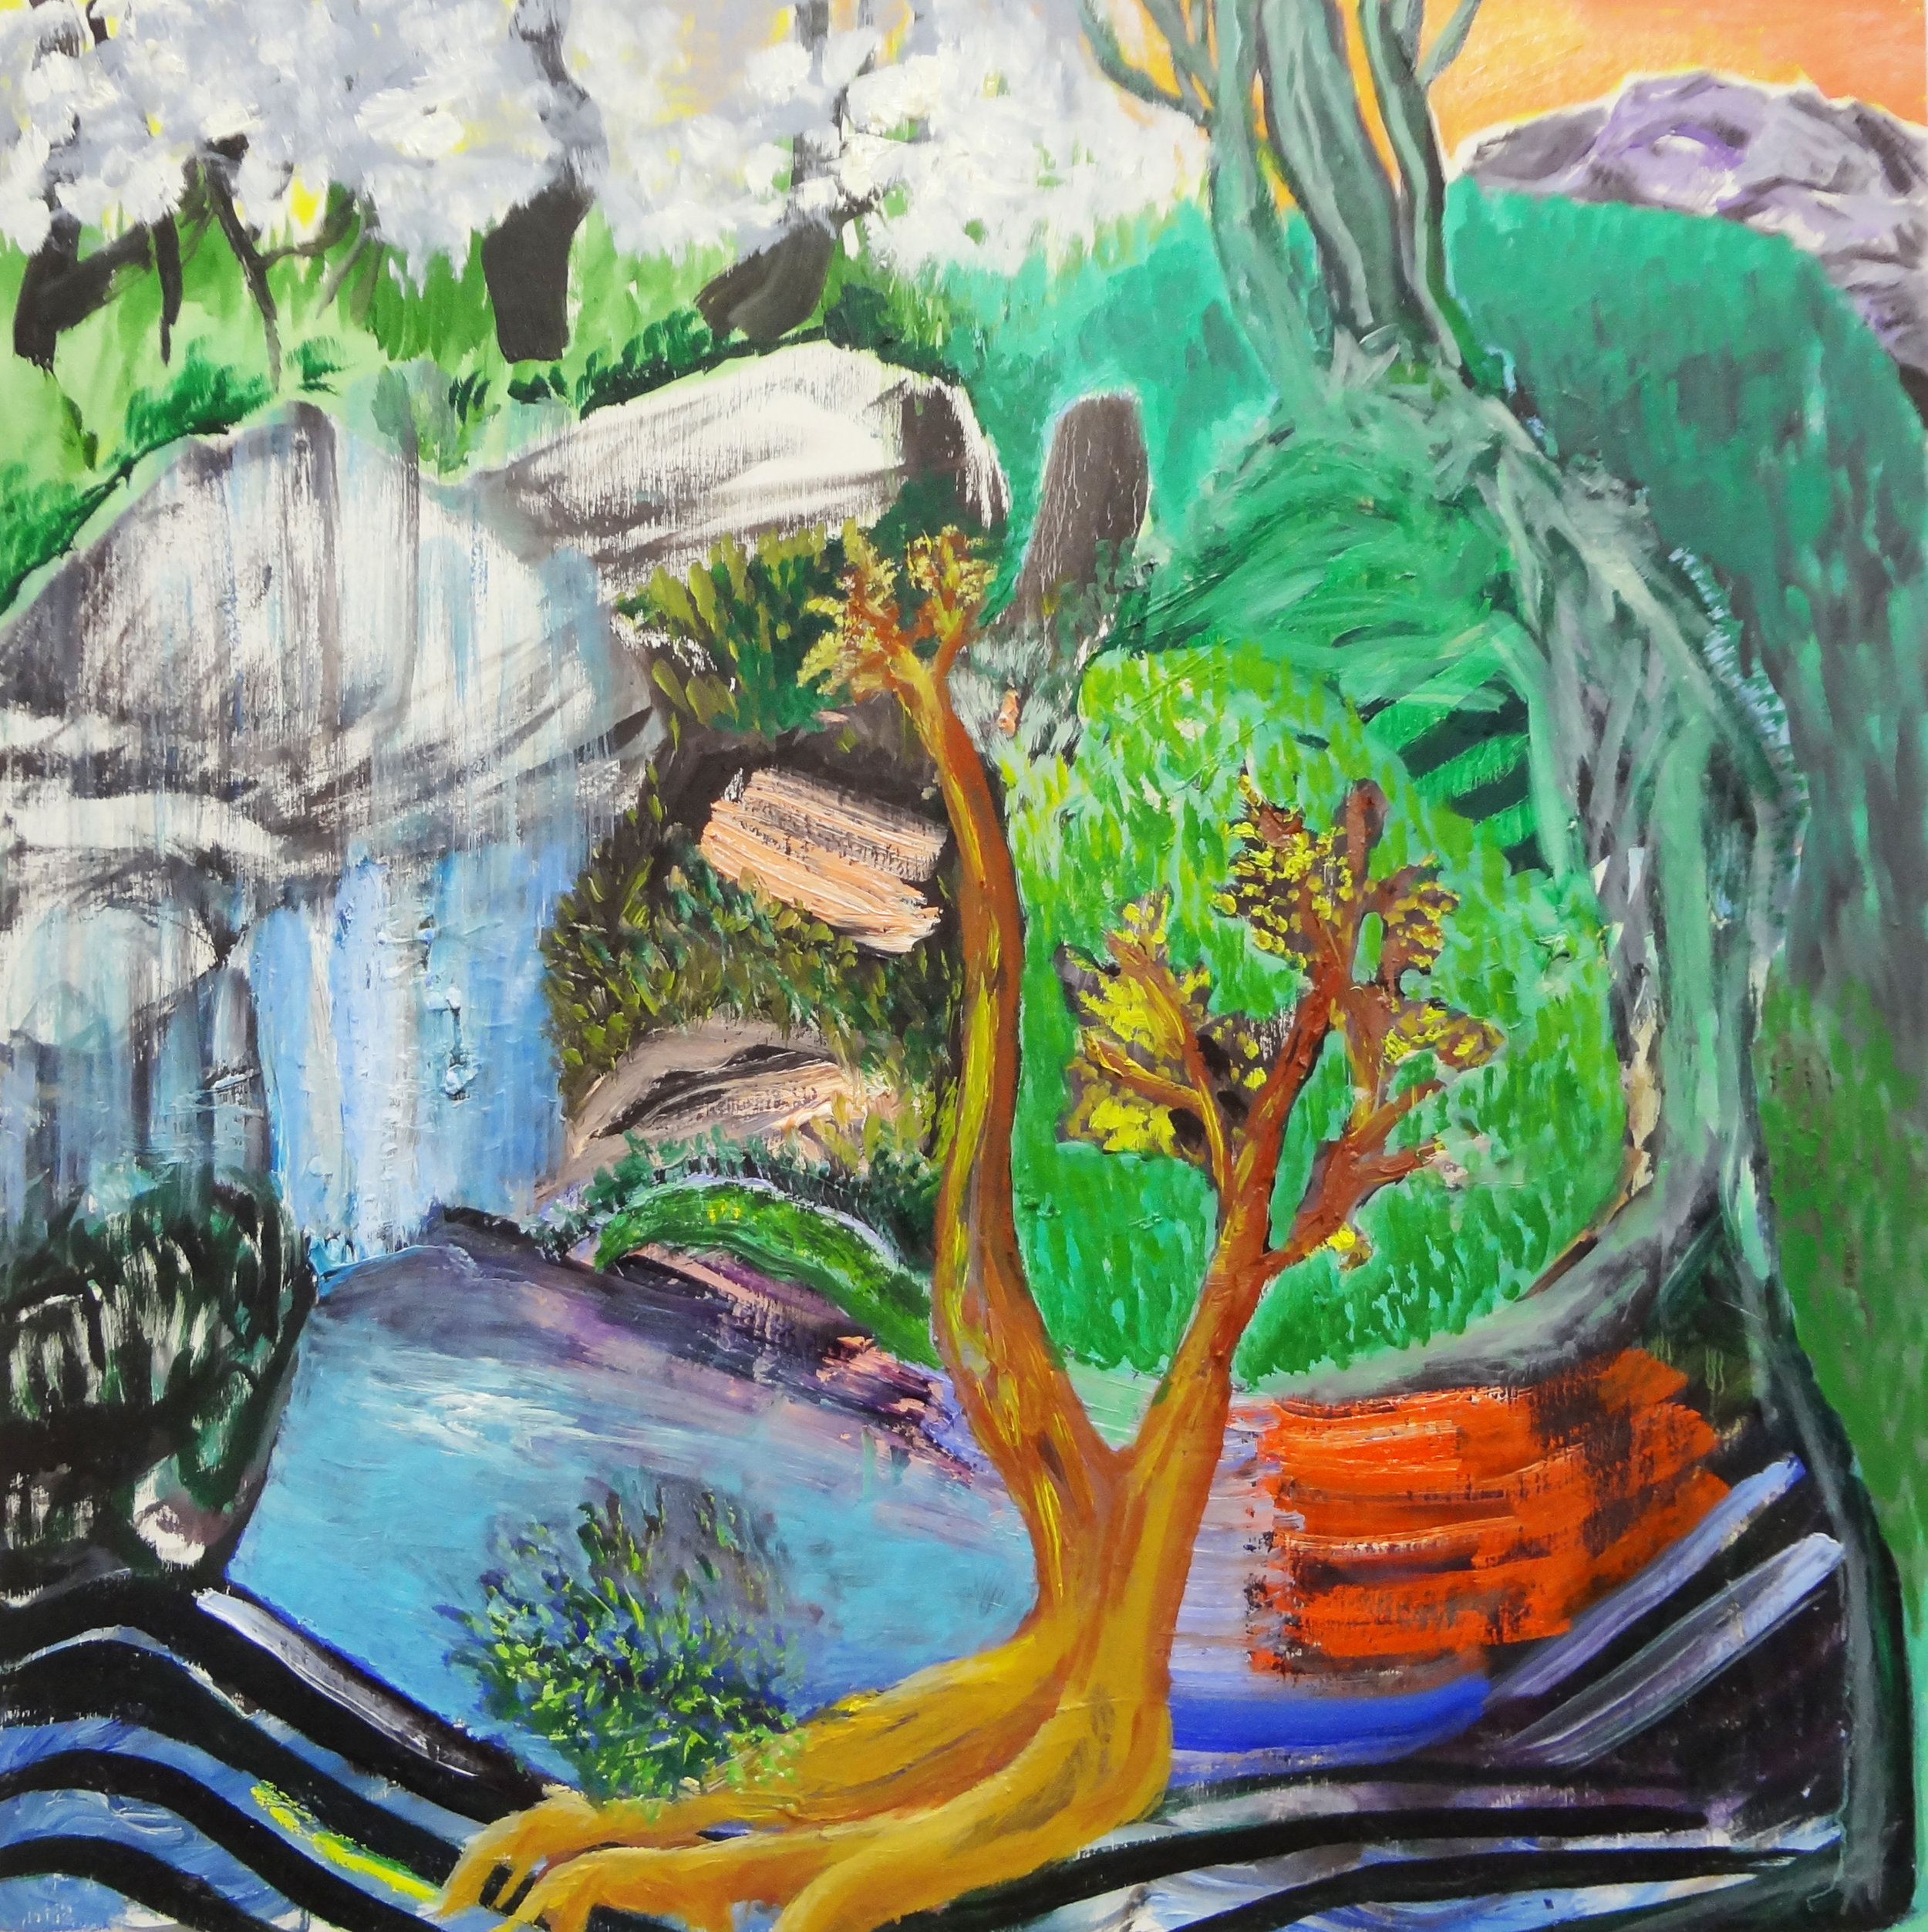 "Golden   by Cecilia Whittaker Doe  Oil on Birch Panel, 18"" x 18"", 2018"